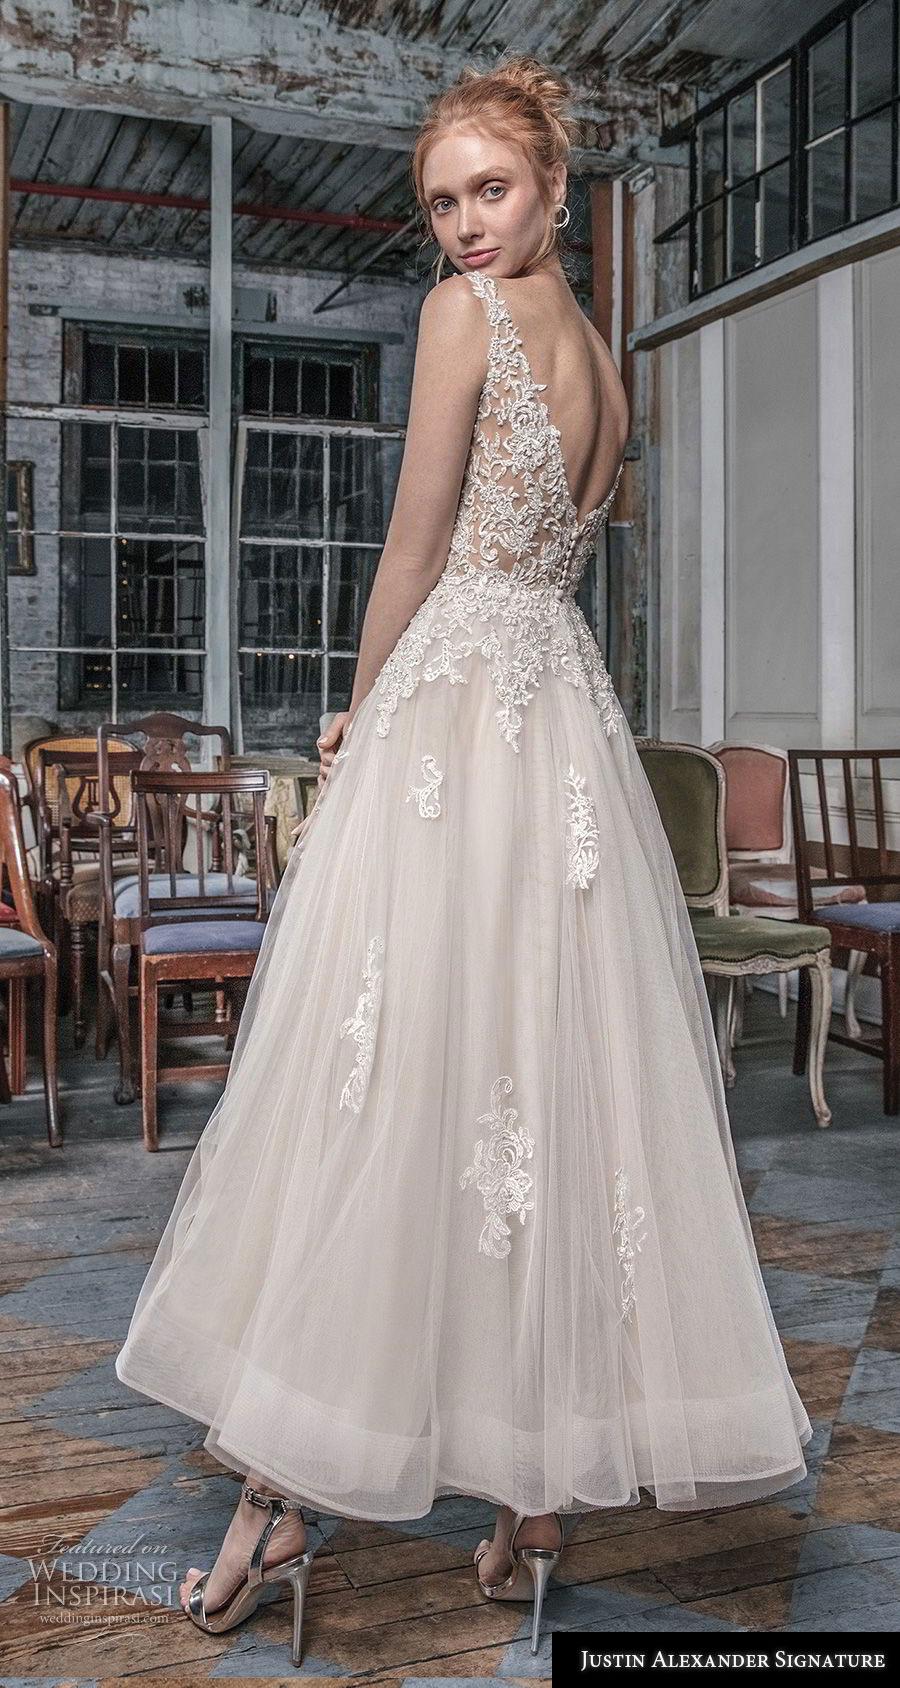 justin alexander fall 2018 signature sleeveless with strap v neck heavily embellished bodice romantic tea length short wedding dress open v back (15) bv